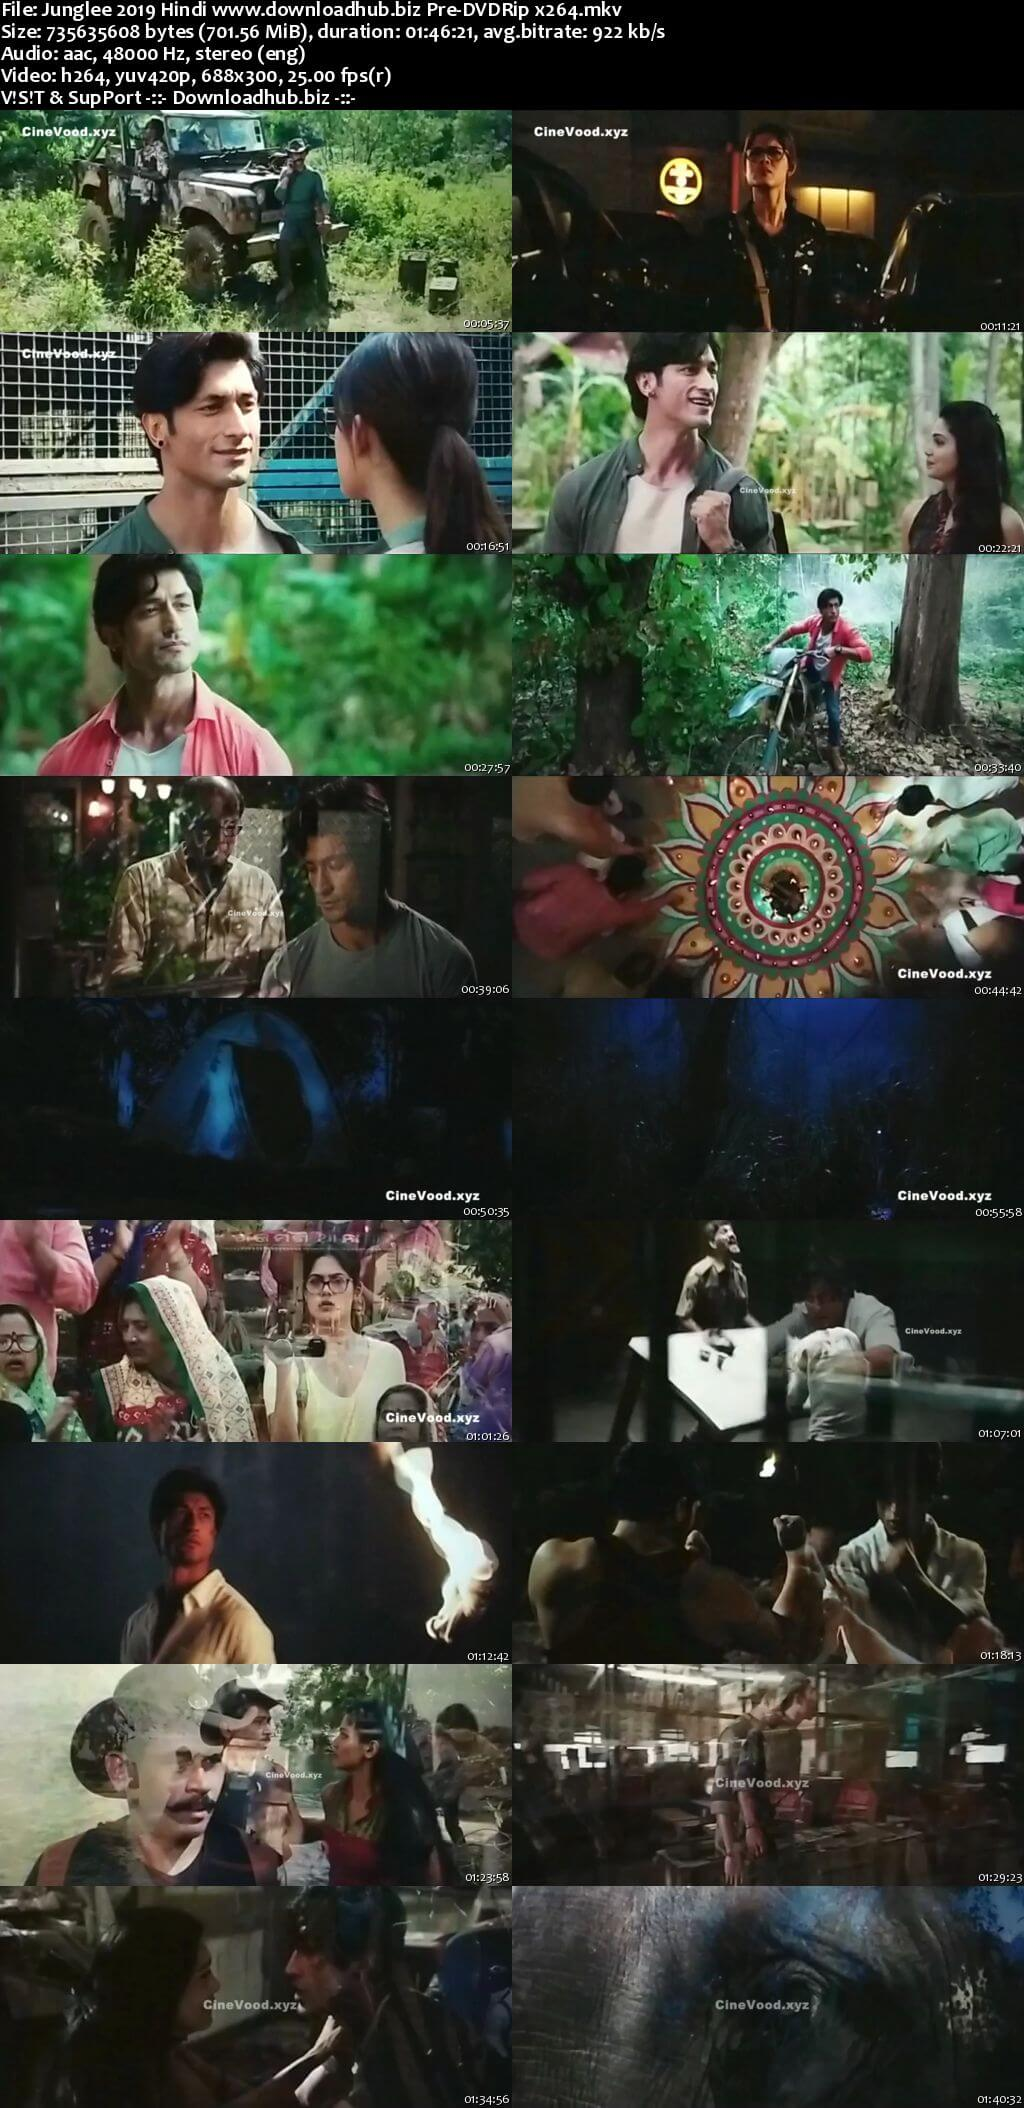 Junglee 2019 Hindi 700MB Pre-DVDRip x264